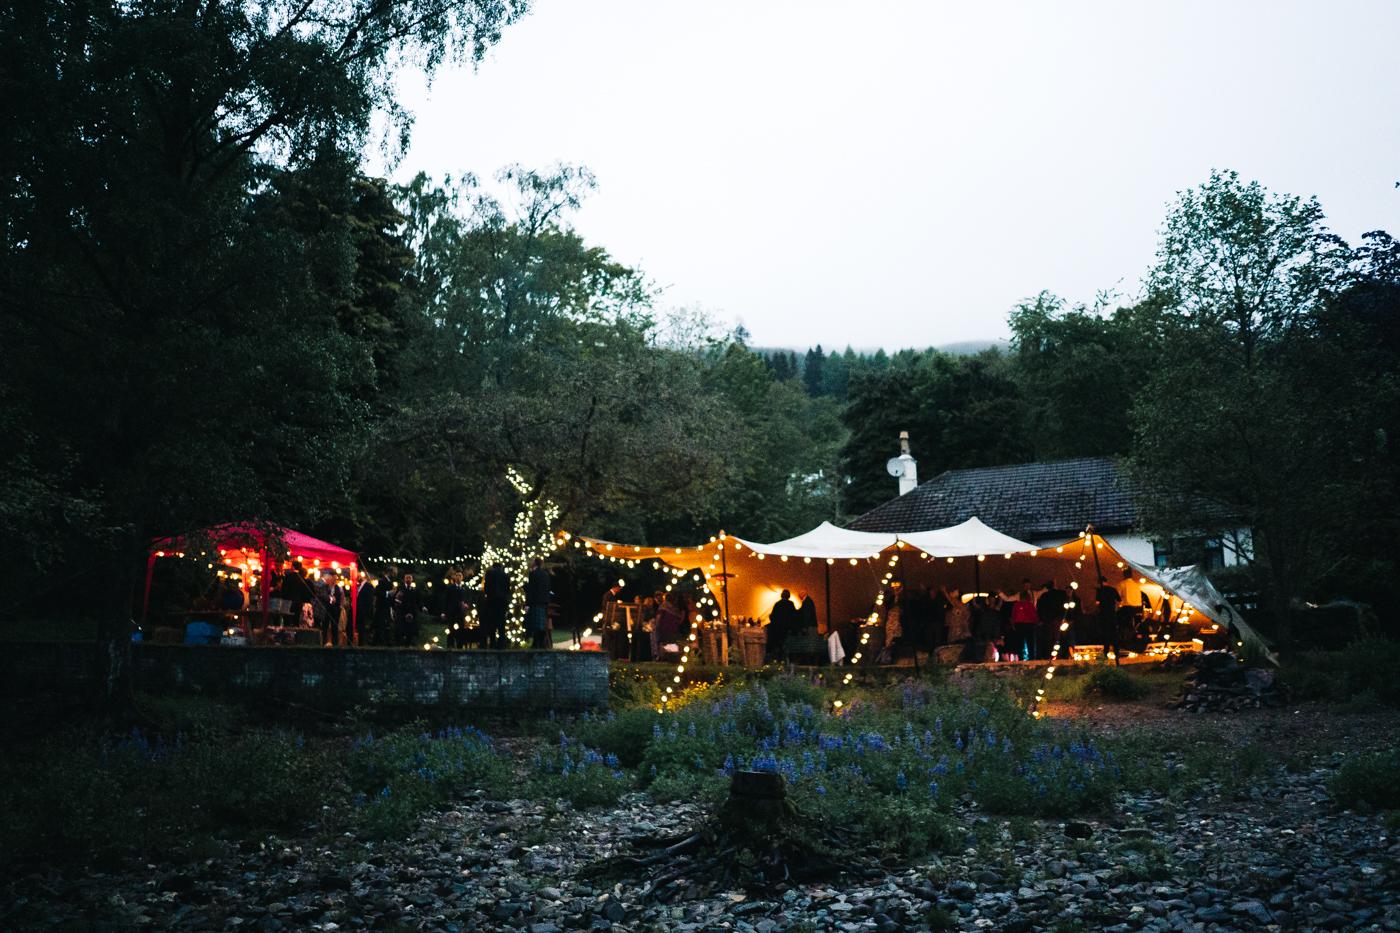 scottish-wedding-trossachs-loch-tay-highlannds-relaxed-photography-photographer-0051.jpg